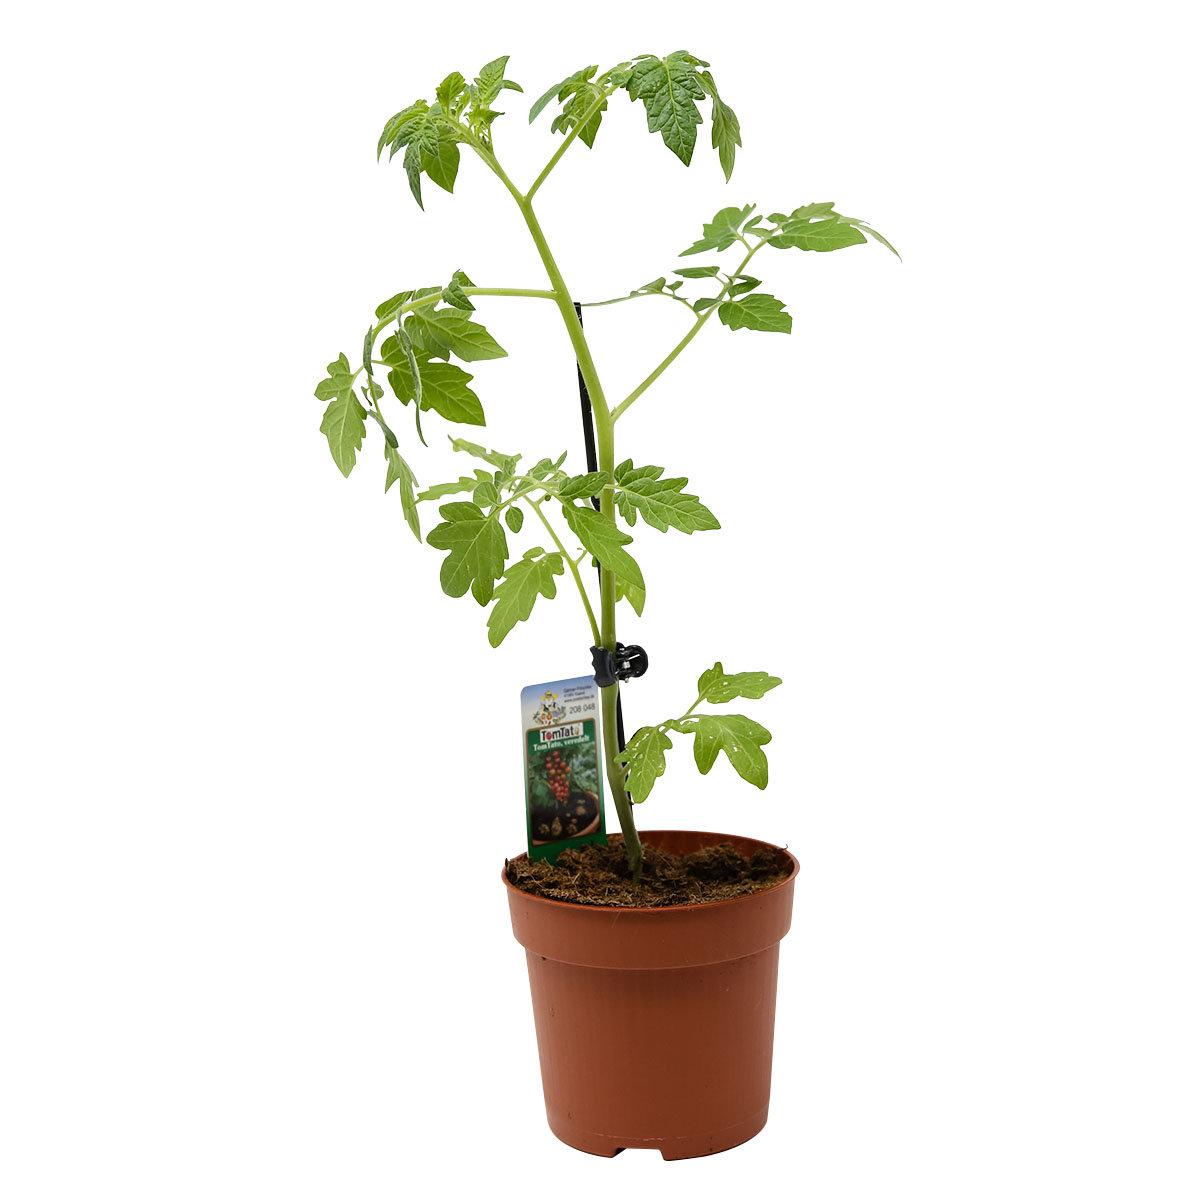 Tomaten-Kartoffelpflanze TomTato, veredelt | #4